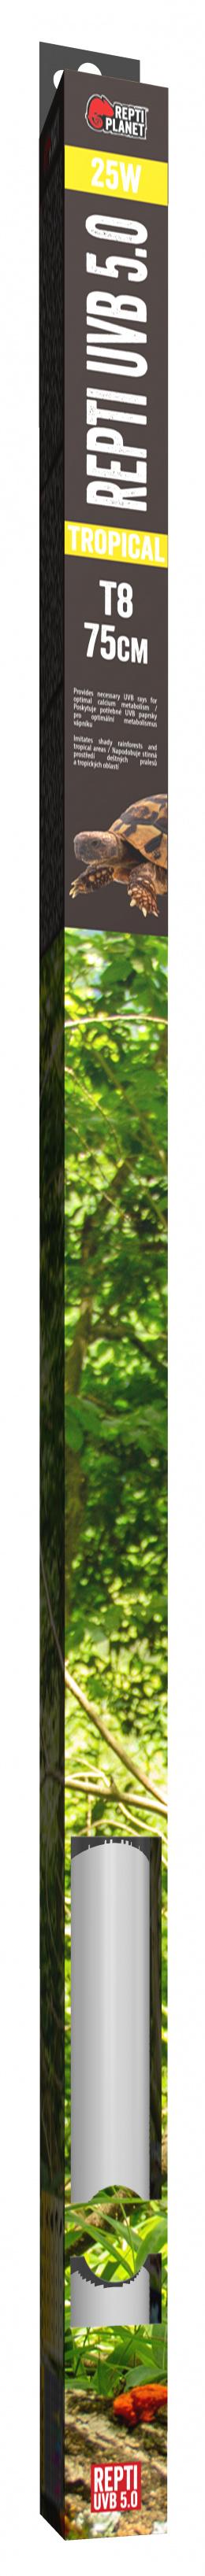 RP ziarivka Fluorescent UVB 5.0 75cm 25W